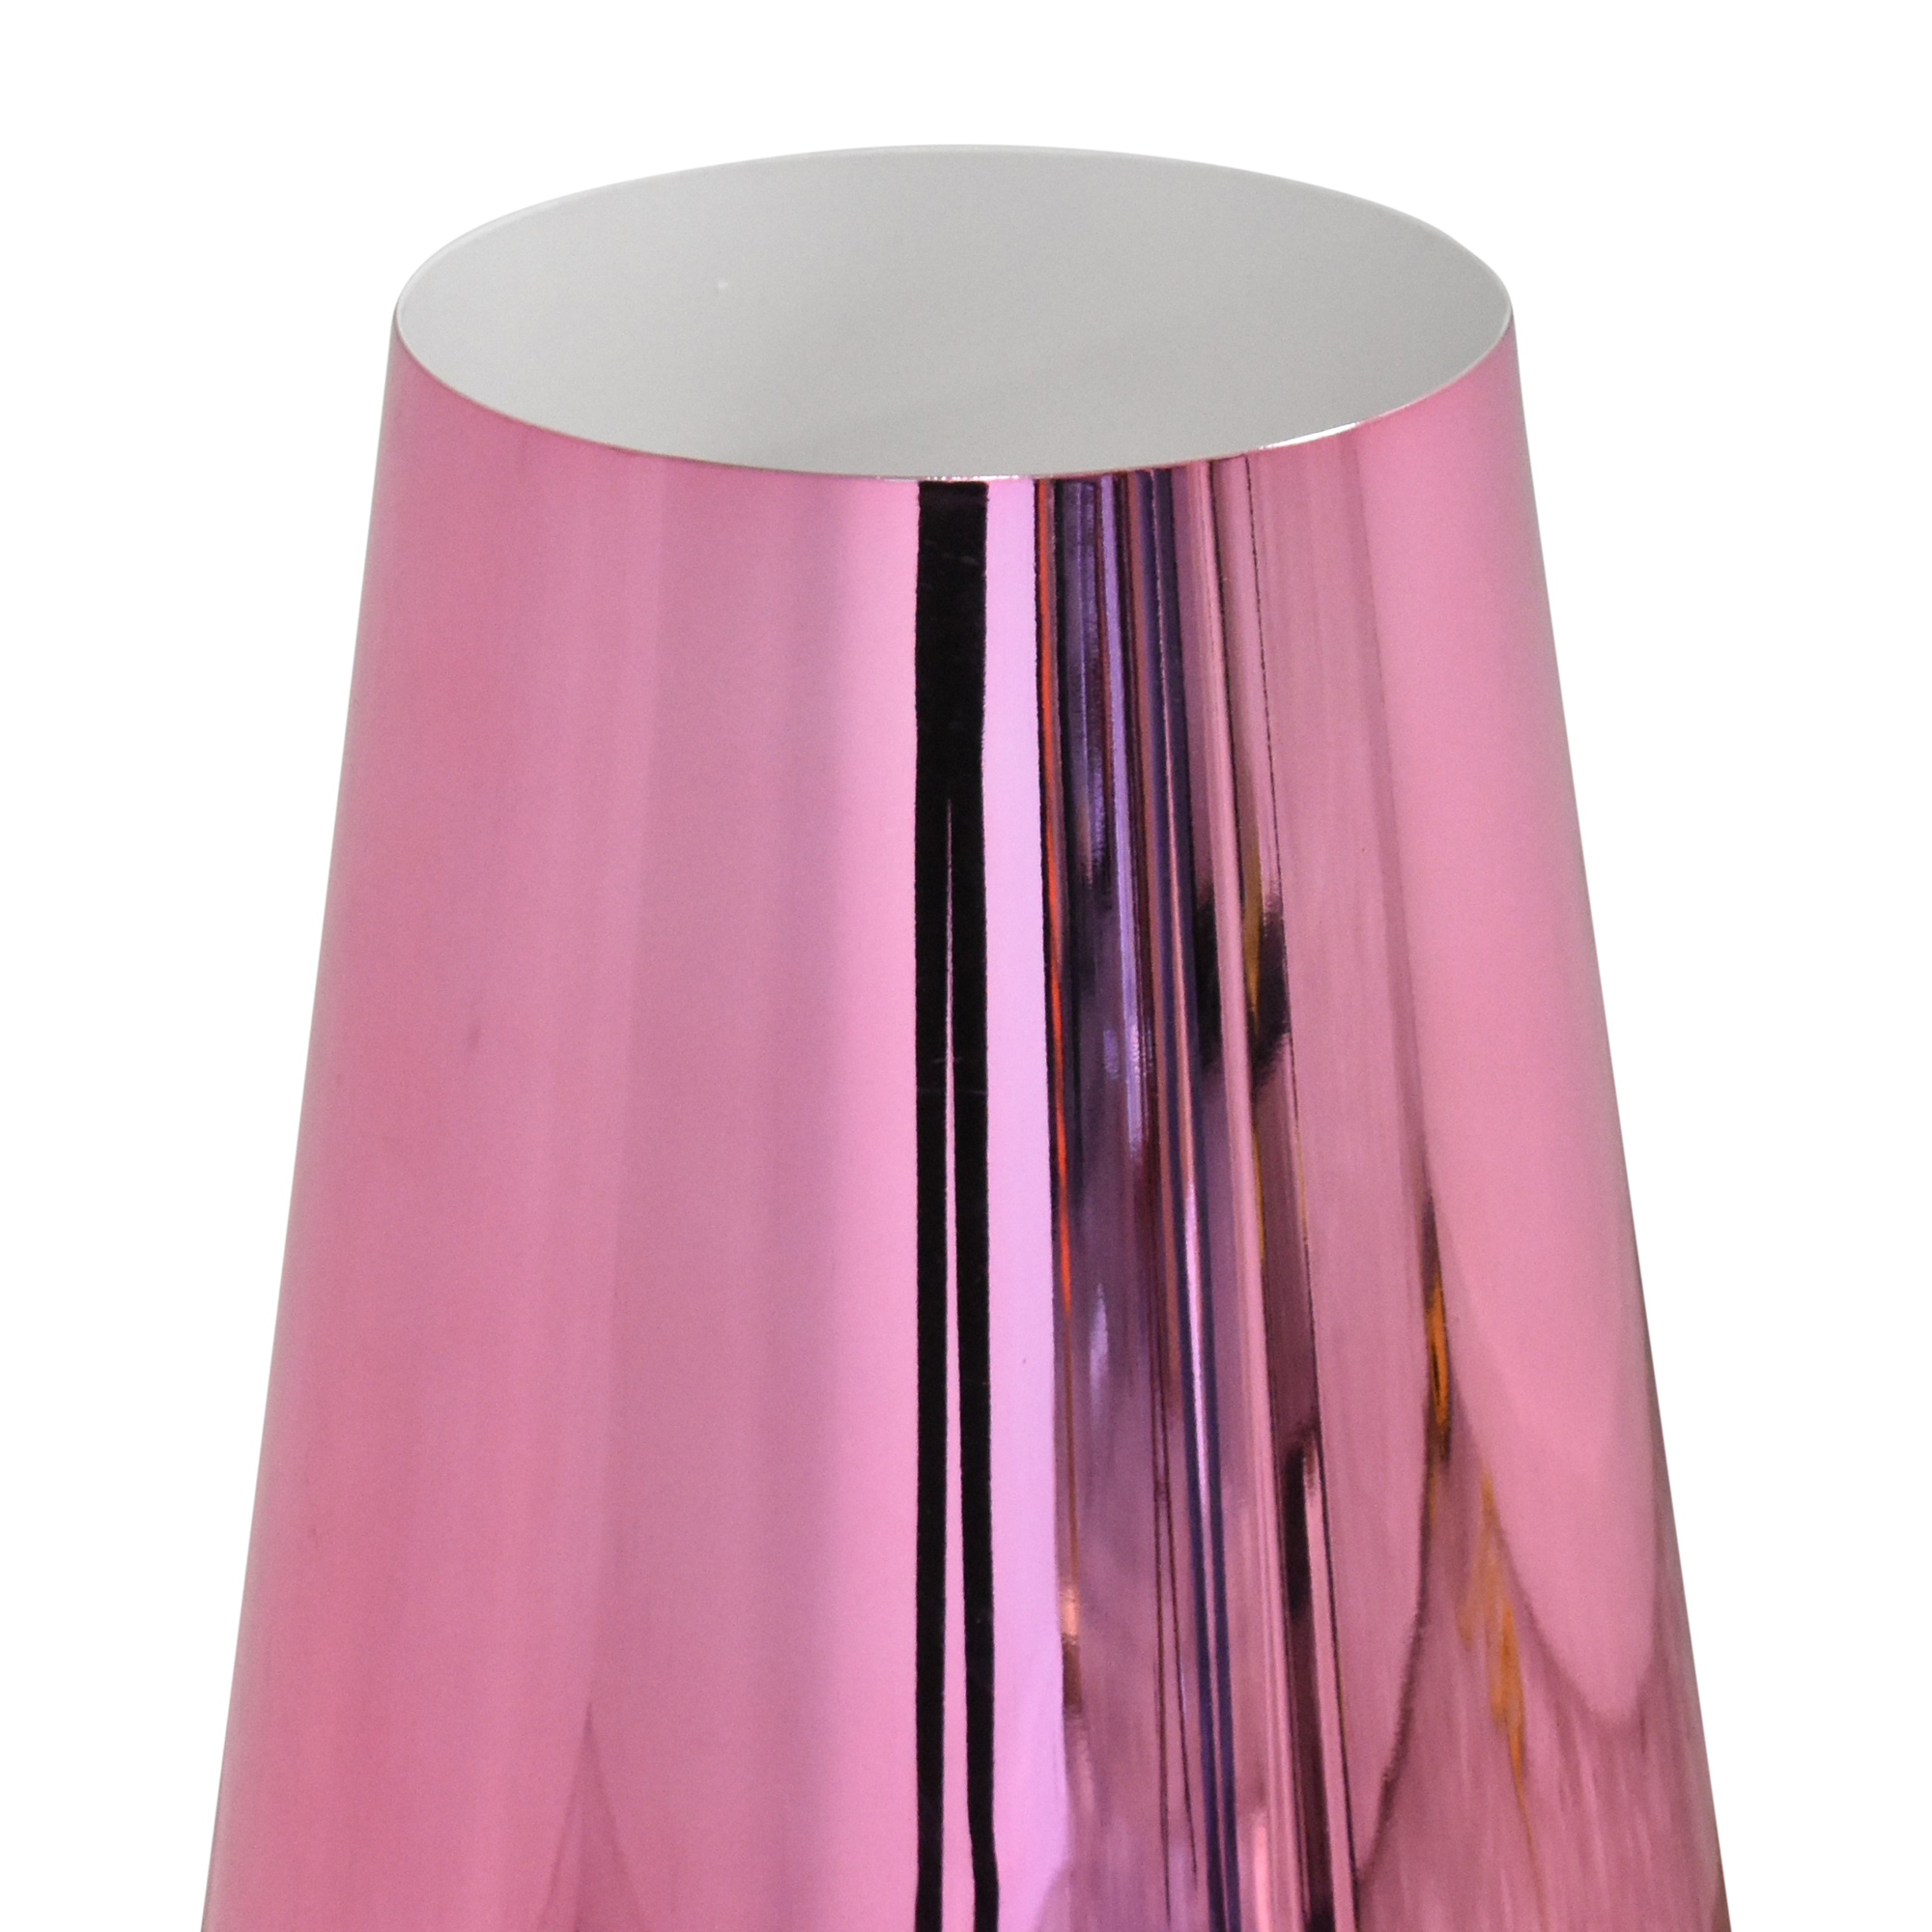 Kartell Kartell Cindy Table Lamp used